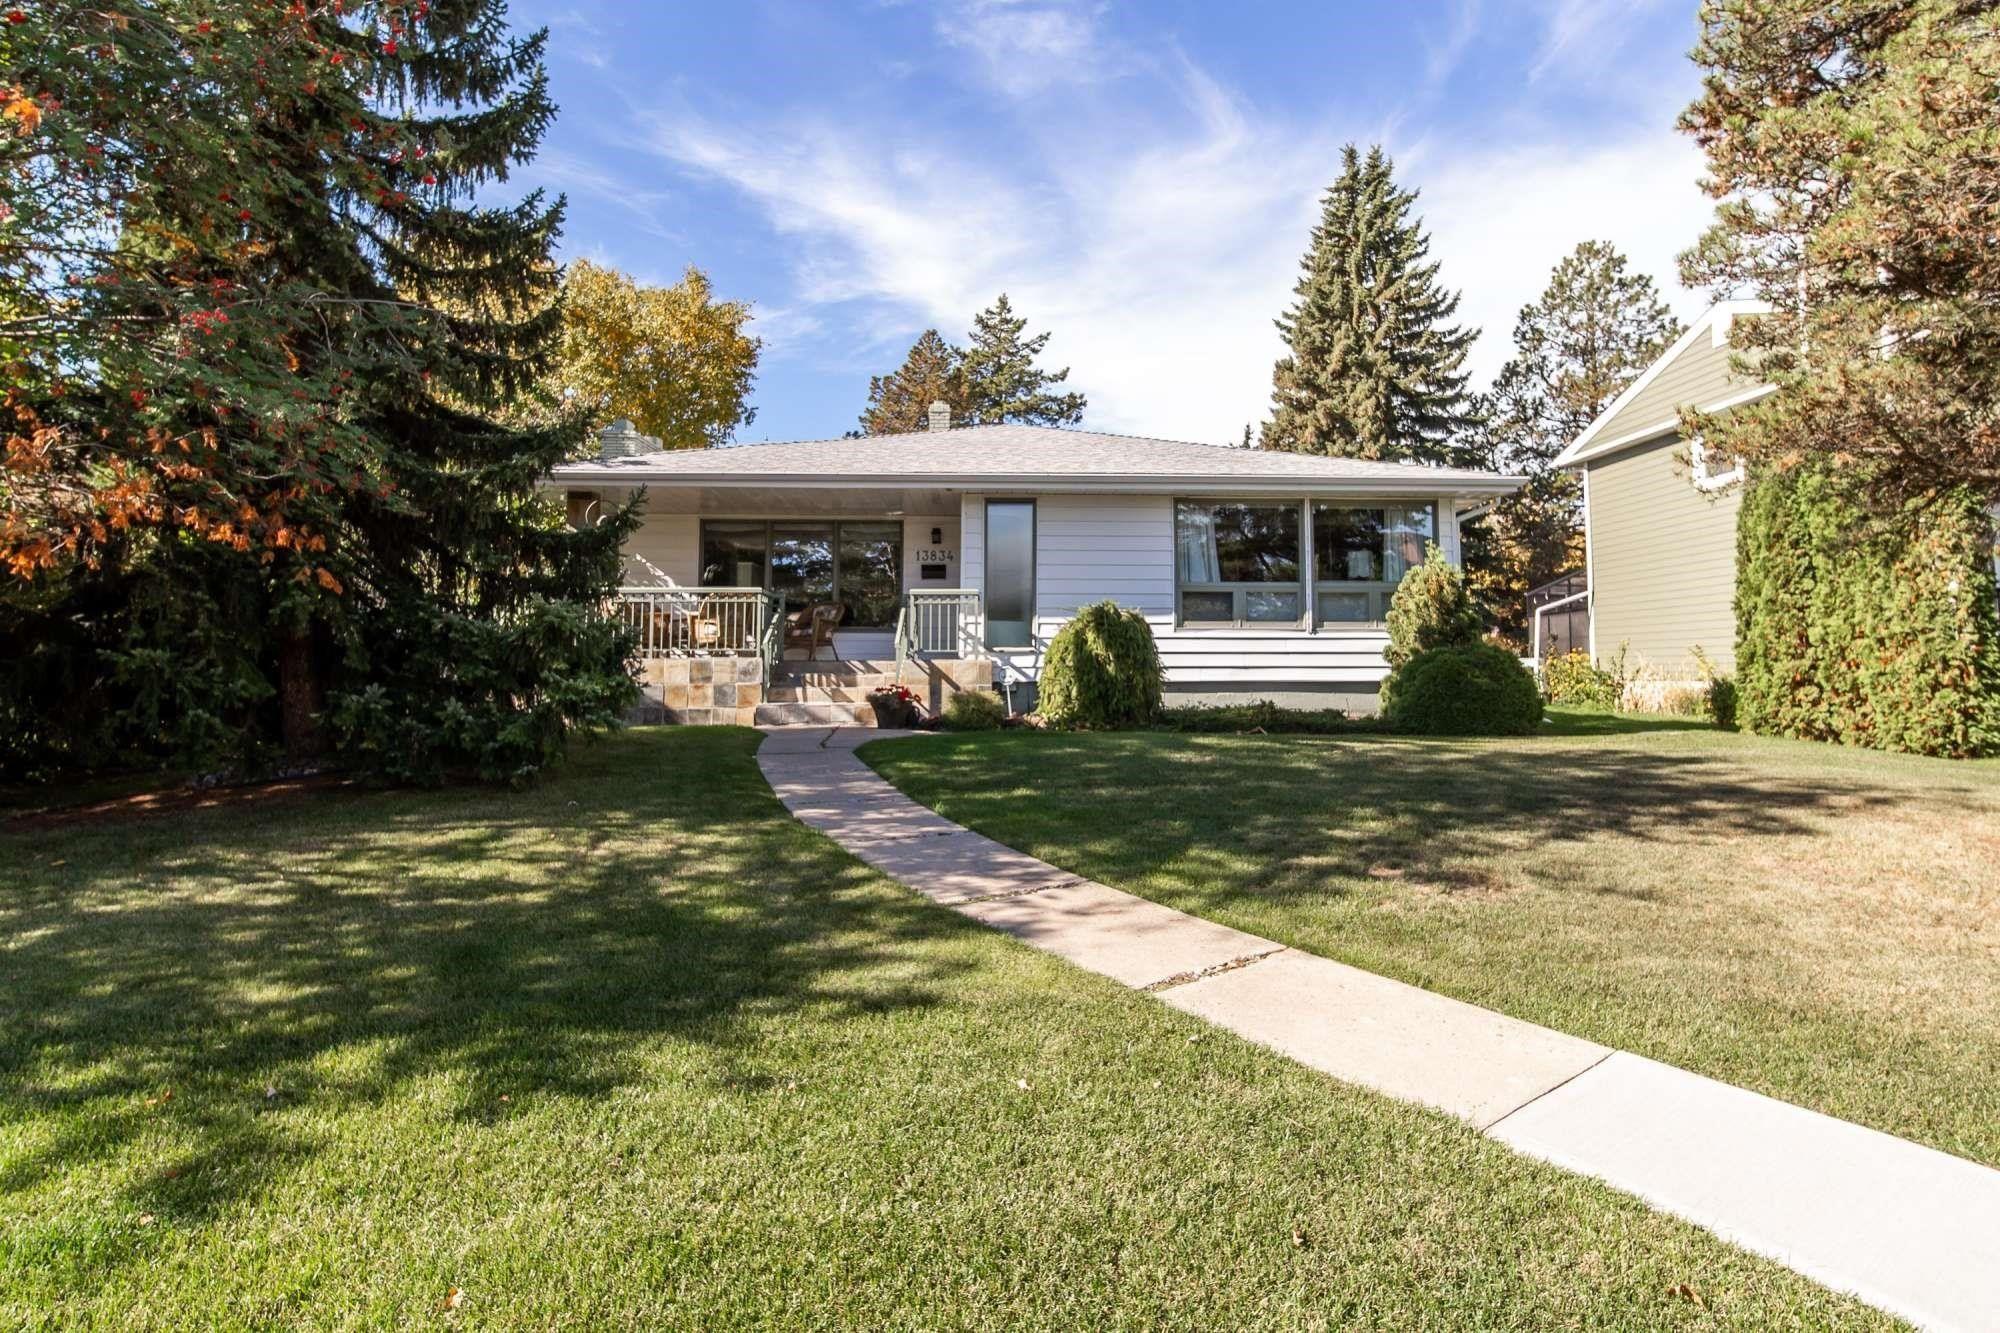 Main Photo: 13834 RAVINE Drive in Edmonton: Zone 11 House for sale : MLS®# E4264760